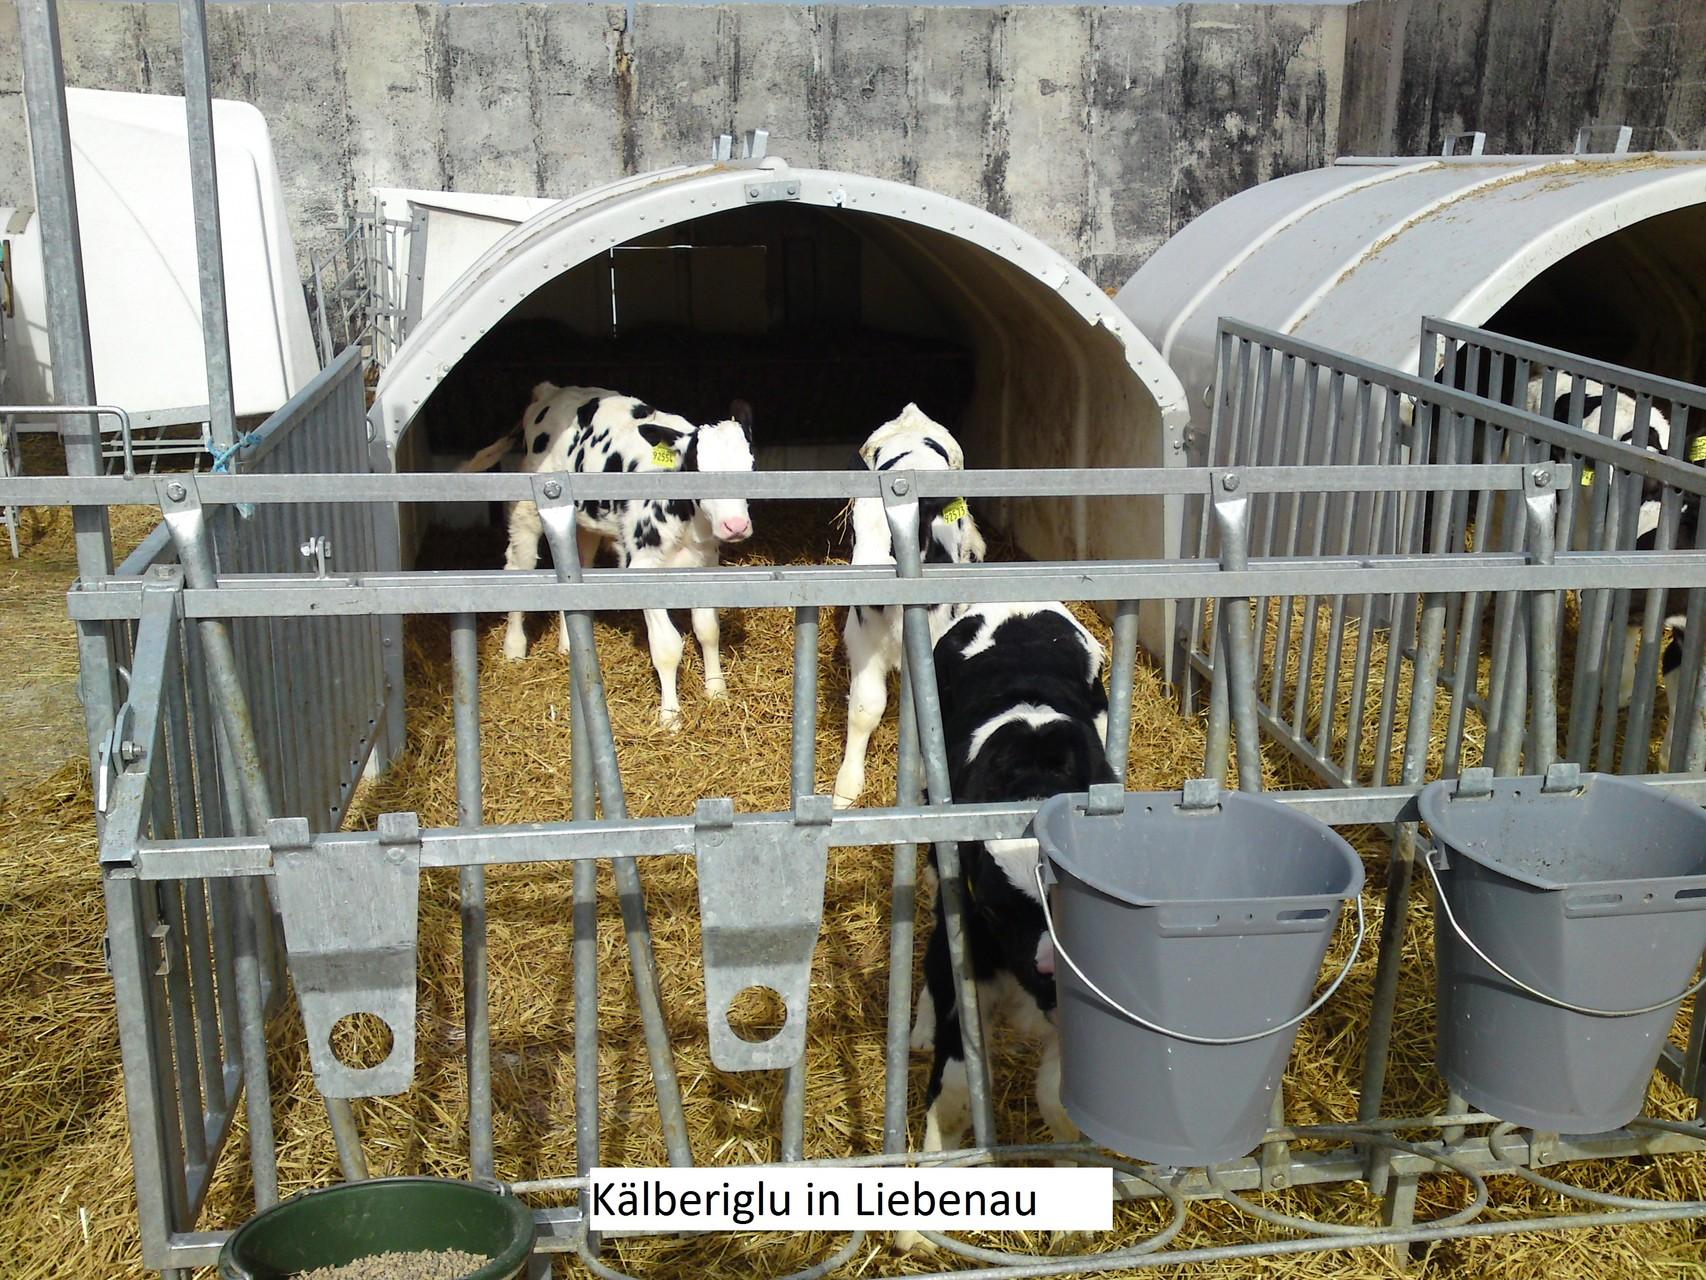 Liebenauer agrar gmbh altenberg webcam